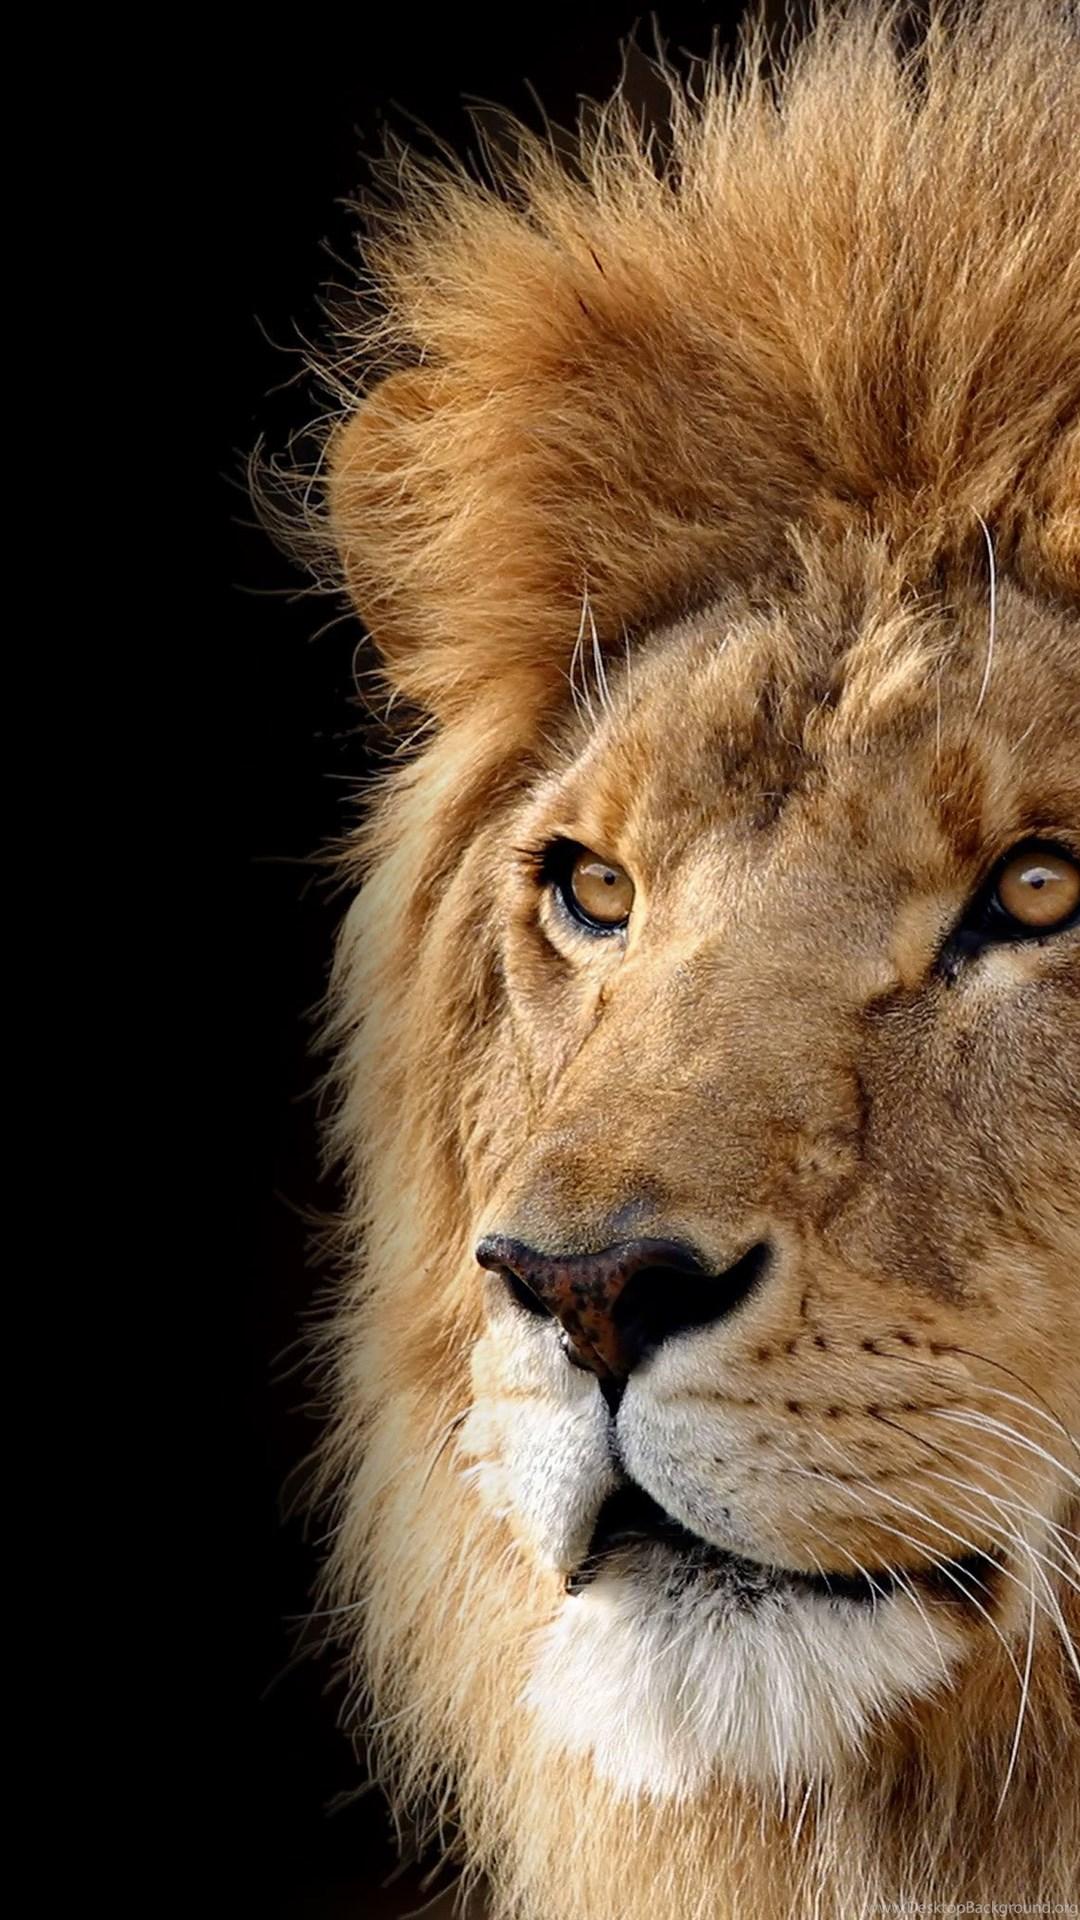 Animal Big Cat Lion Hd Wallpapers Desktop Background